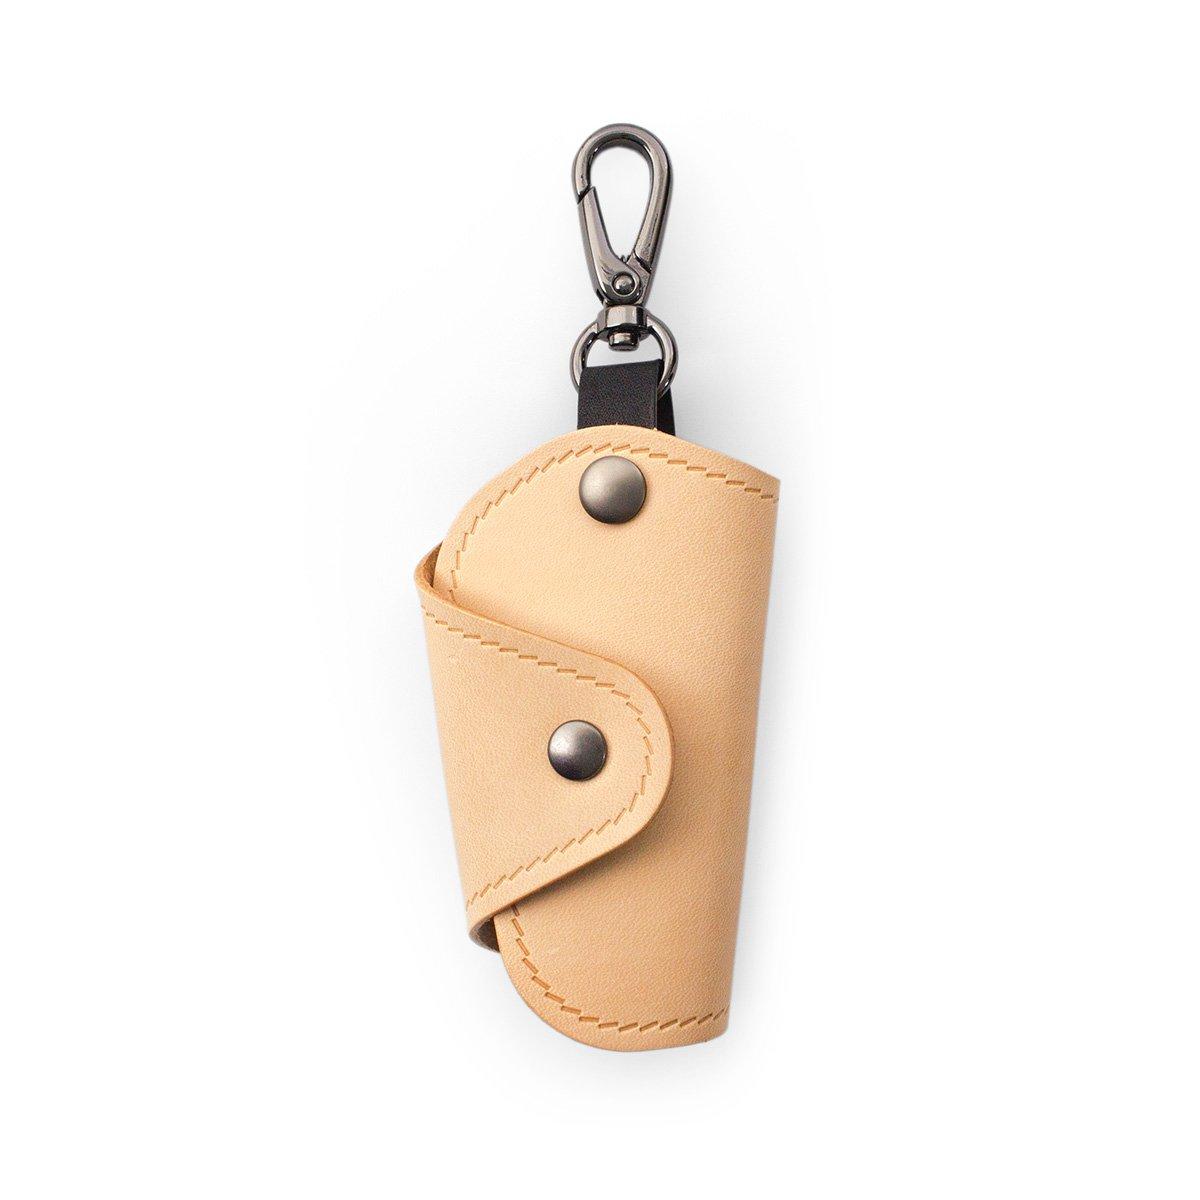 WILD 車鑰匙套